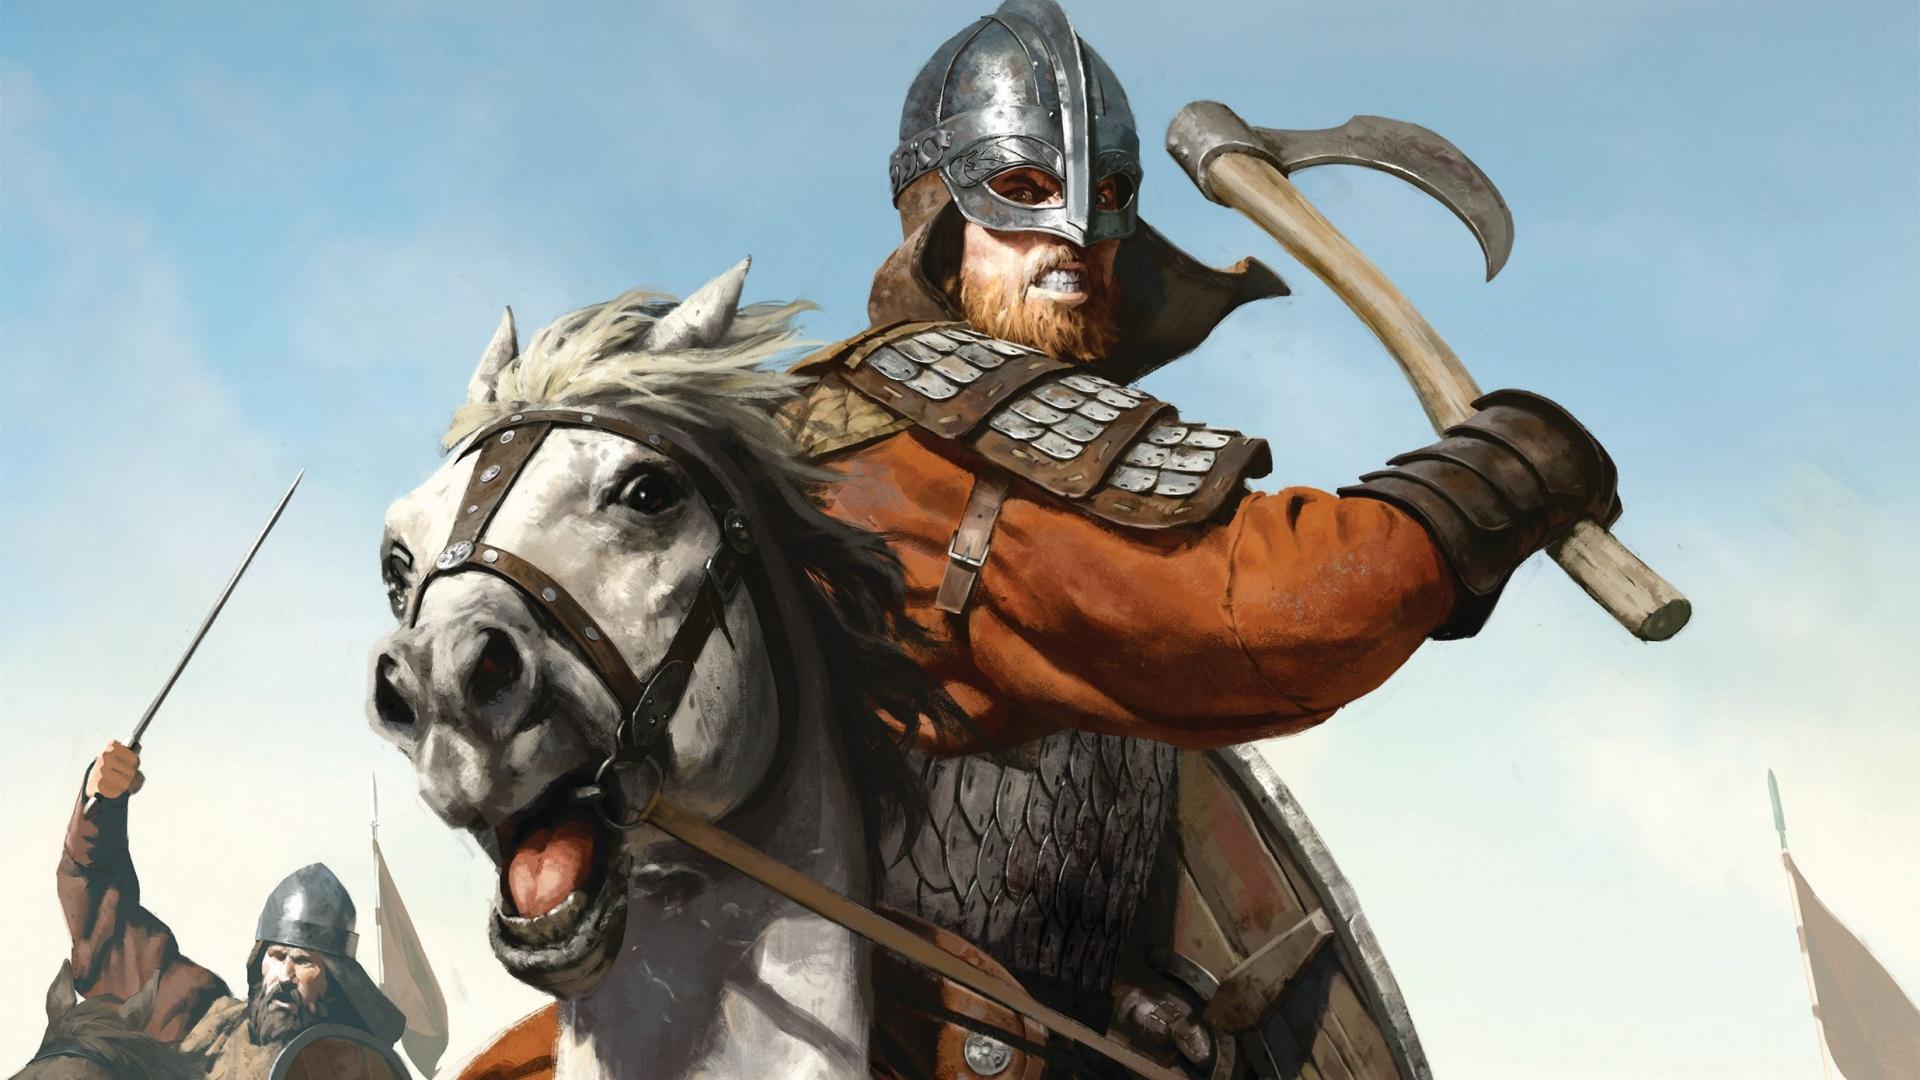 Ранний доступ Mount & Blade II: Bannerlord начнётся на24 часа раньше